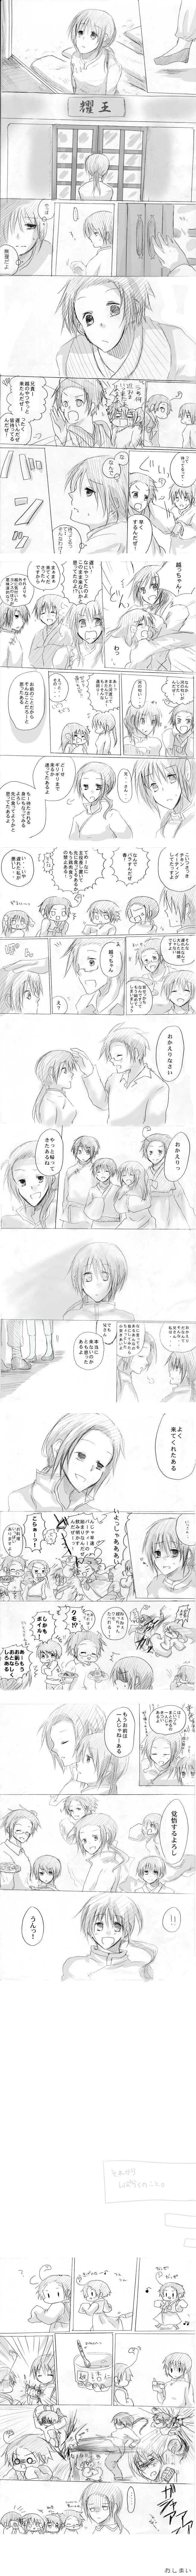 Tags: Anime, Axis Powers: Hetalia, Vietnam, Taiwan, China, South Korea, Hong Kong, Thailand, Japan, Comic, Allied Forces, Asian Countries, Axis Power Countries